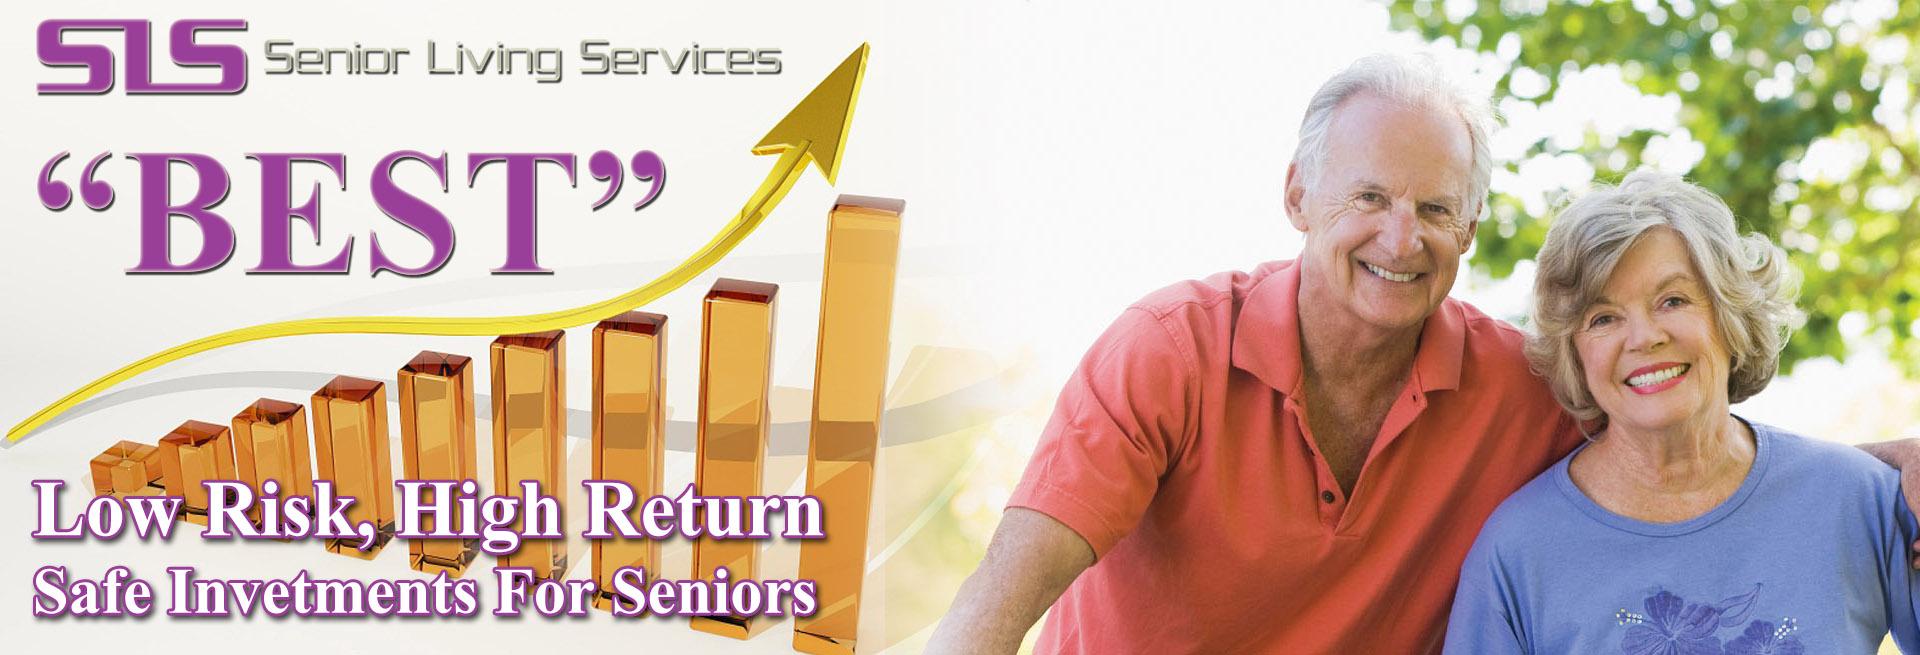 Best Low Risk, High Return, Safe Investments For Seniors